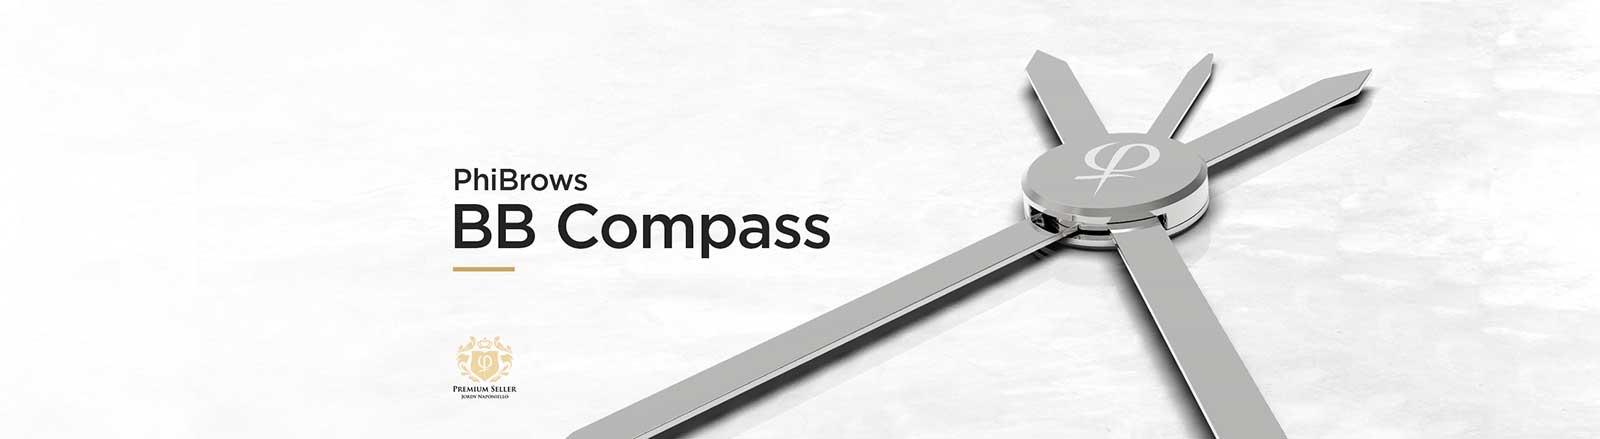 bbcompass